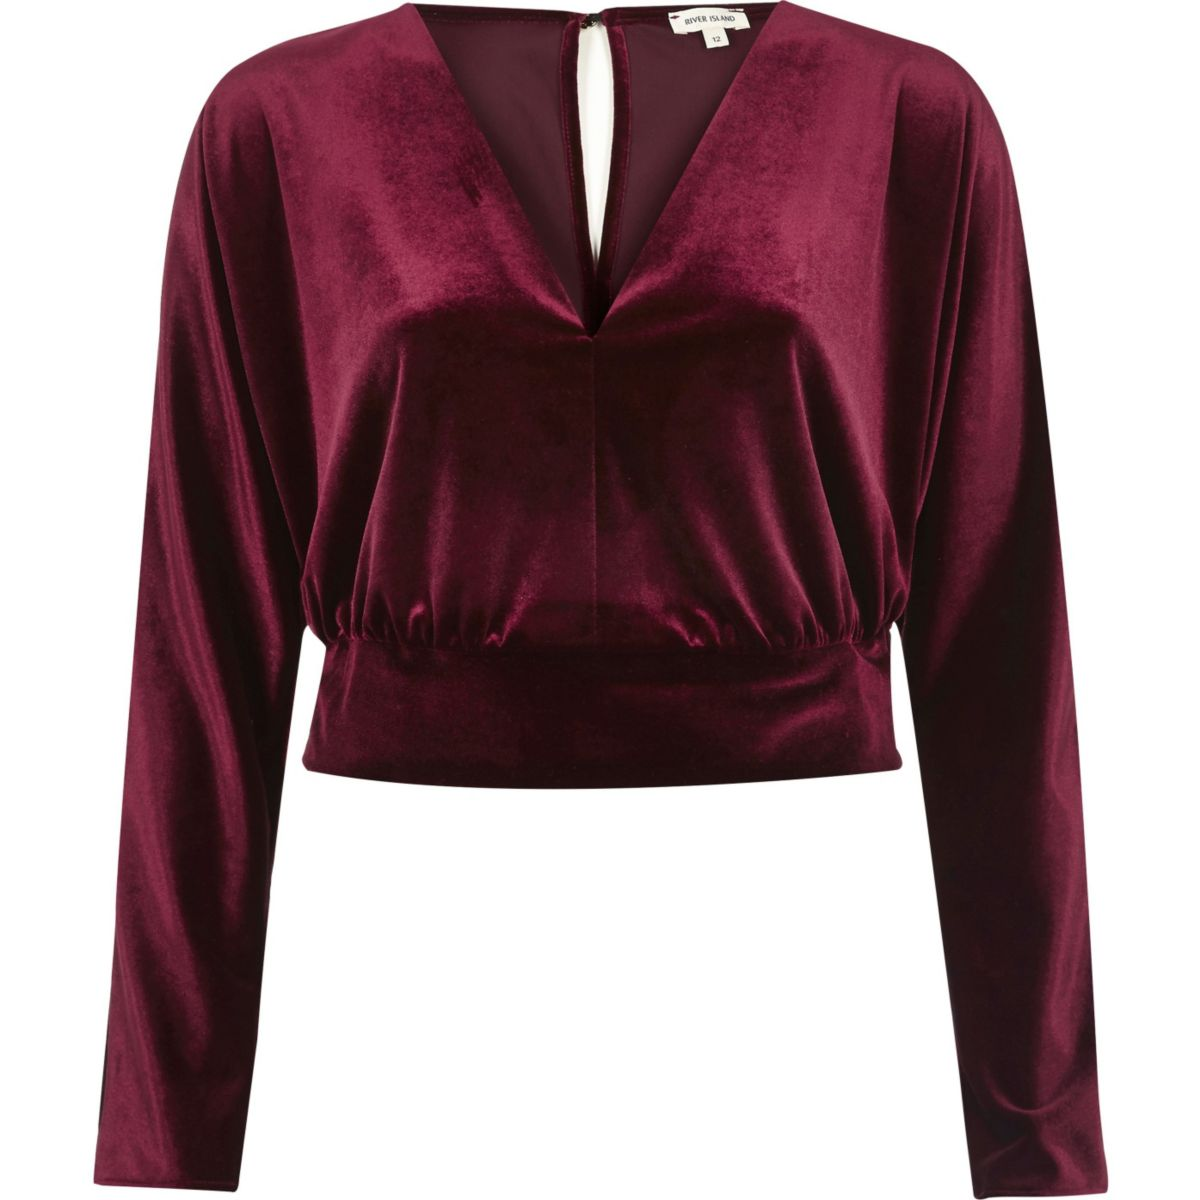 Dark red velvet long sleeve crop top